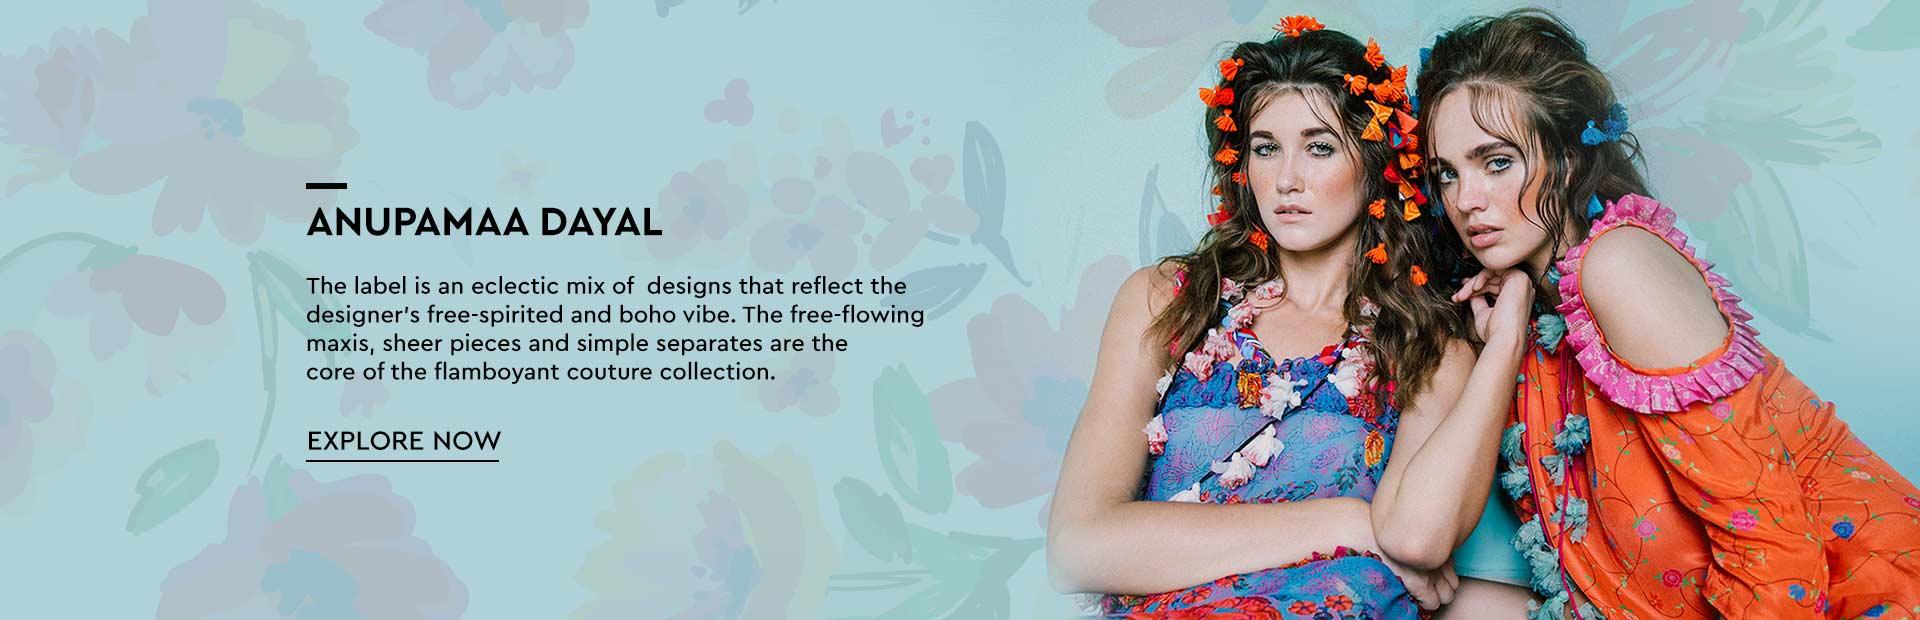 d2a7253a6f Anupamaa Dayal- Shop for The Vibrant Anupamaa Dayal Collection| Nykaa  Design Studio